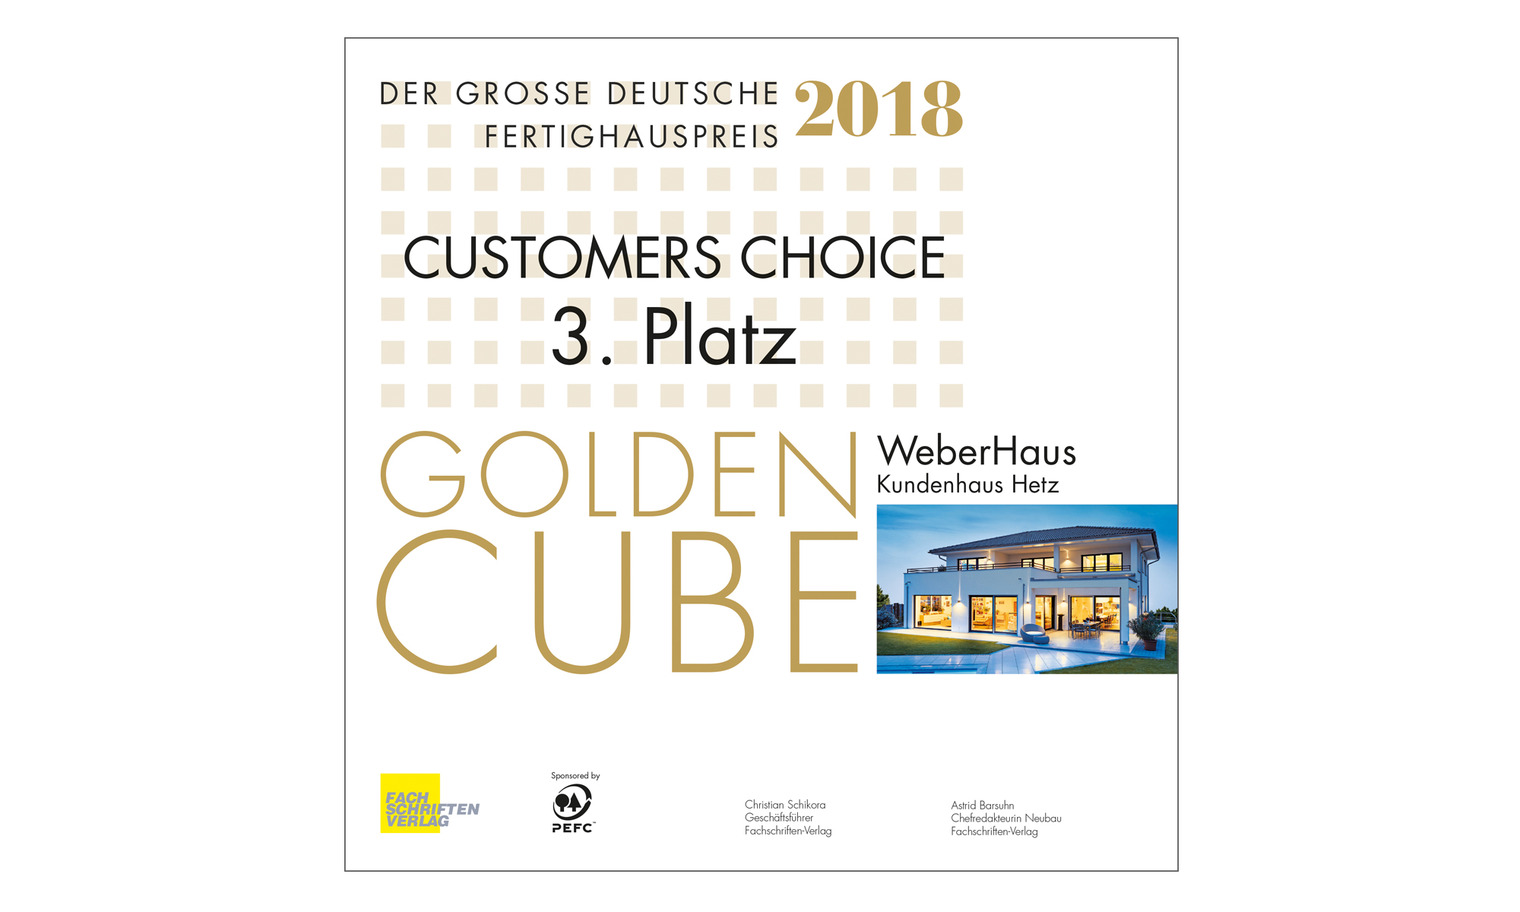 Großer Deutscher Fertighauspreis 2018, Customers Choice